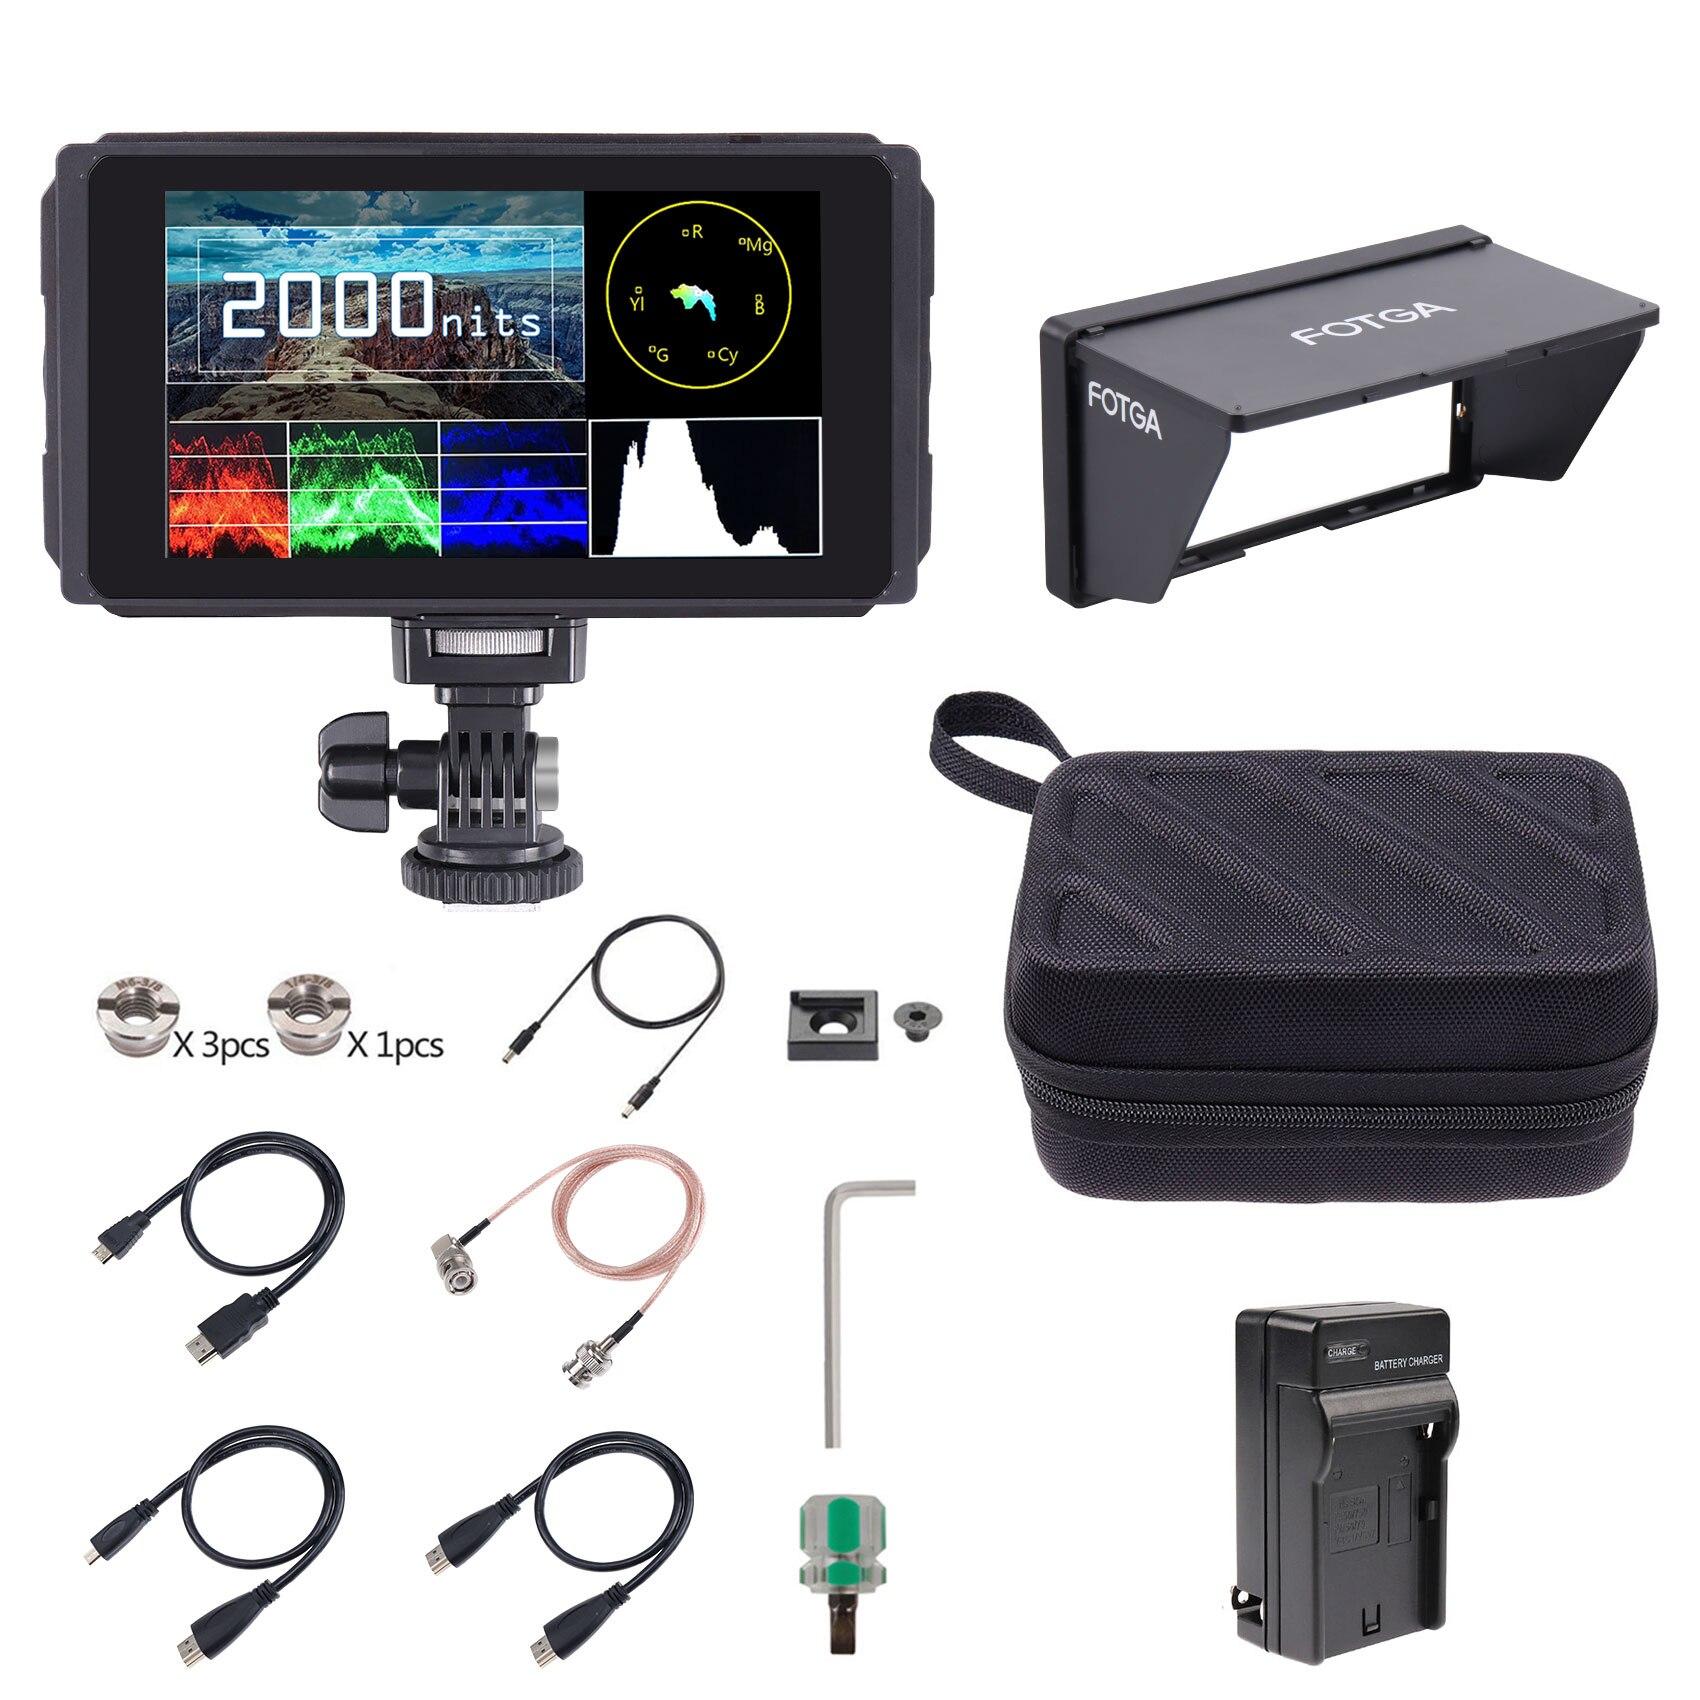 Fotga C50-شاشة عرض ميدانية لكاميرا 3G SDI 3D-LUT ، شاشة عرض مع شاشة تعمل باللمس ، IPS HD 2000nit ، 5 بوصة